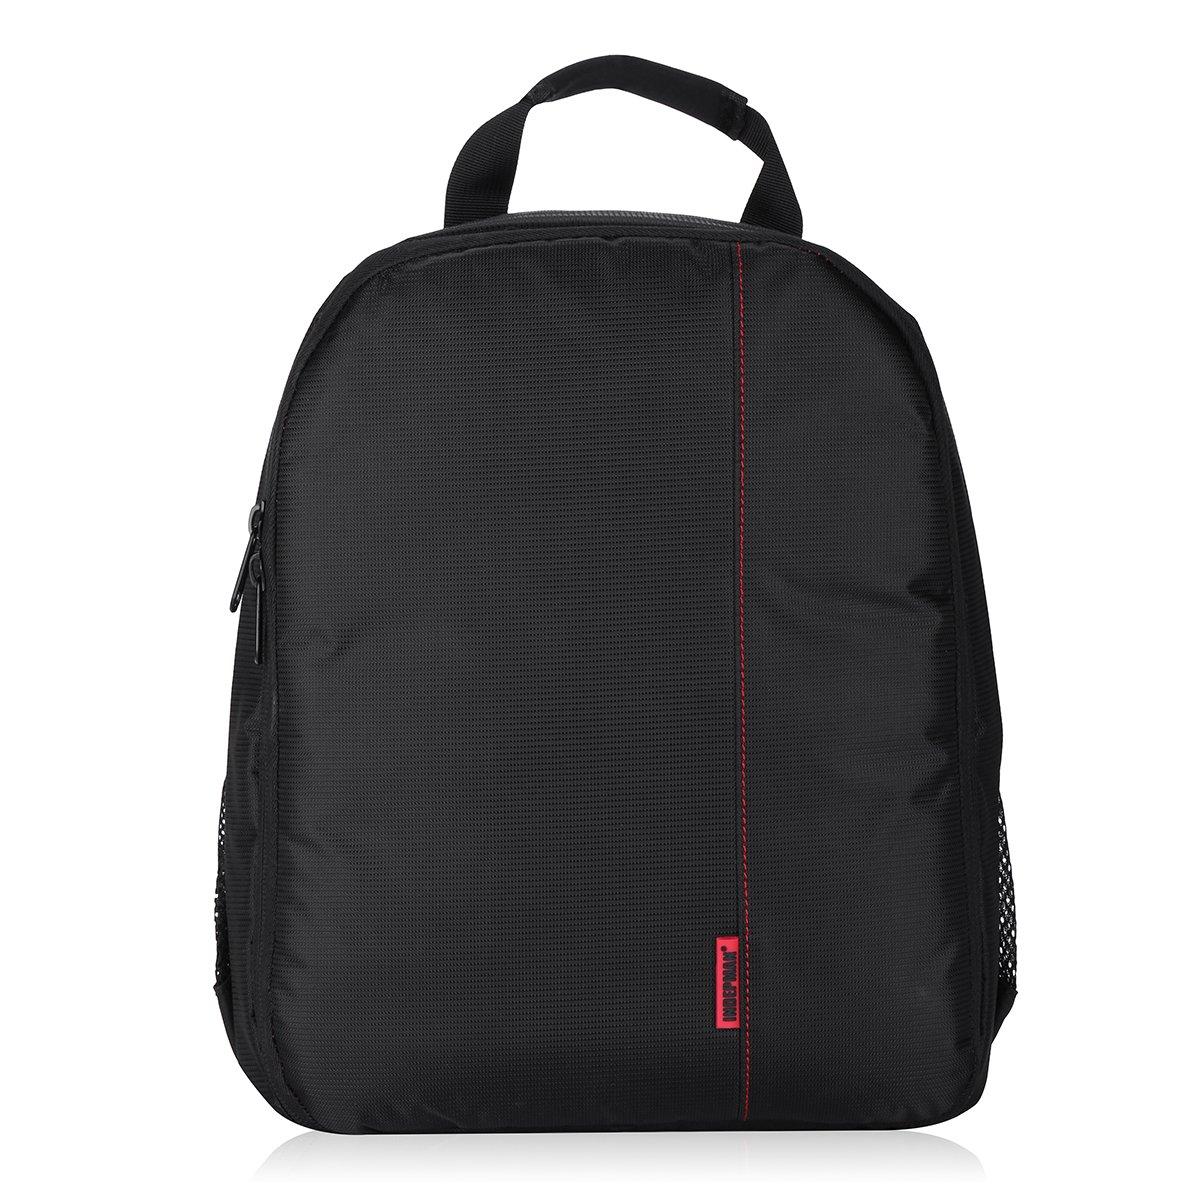 Powerextra Professional Waterproof Backpack Panasonic